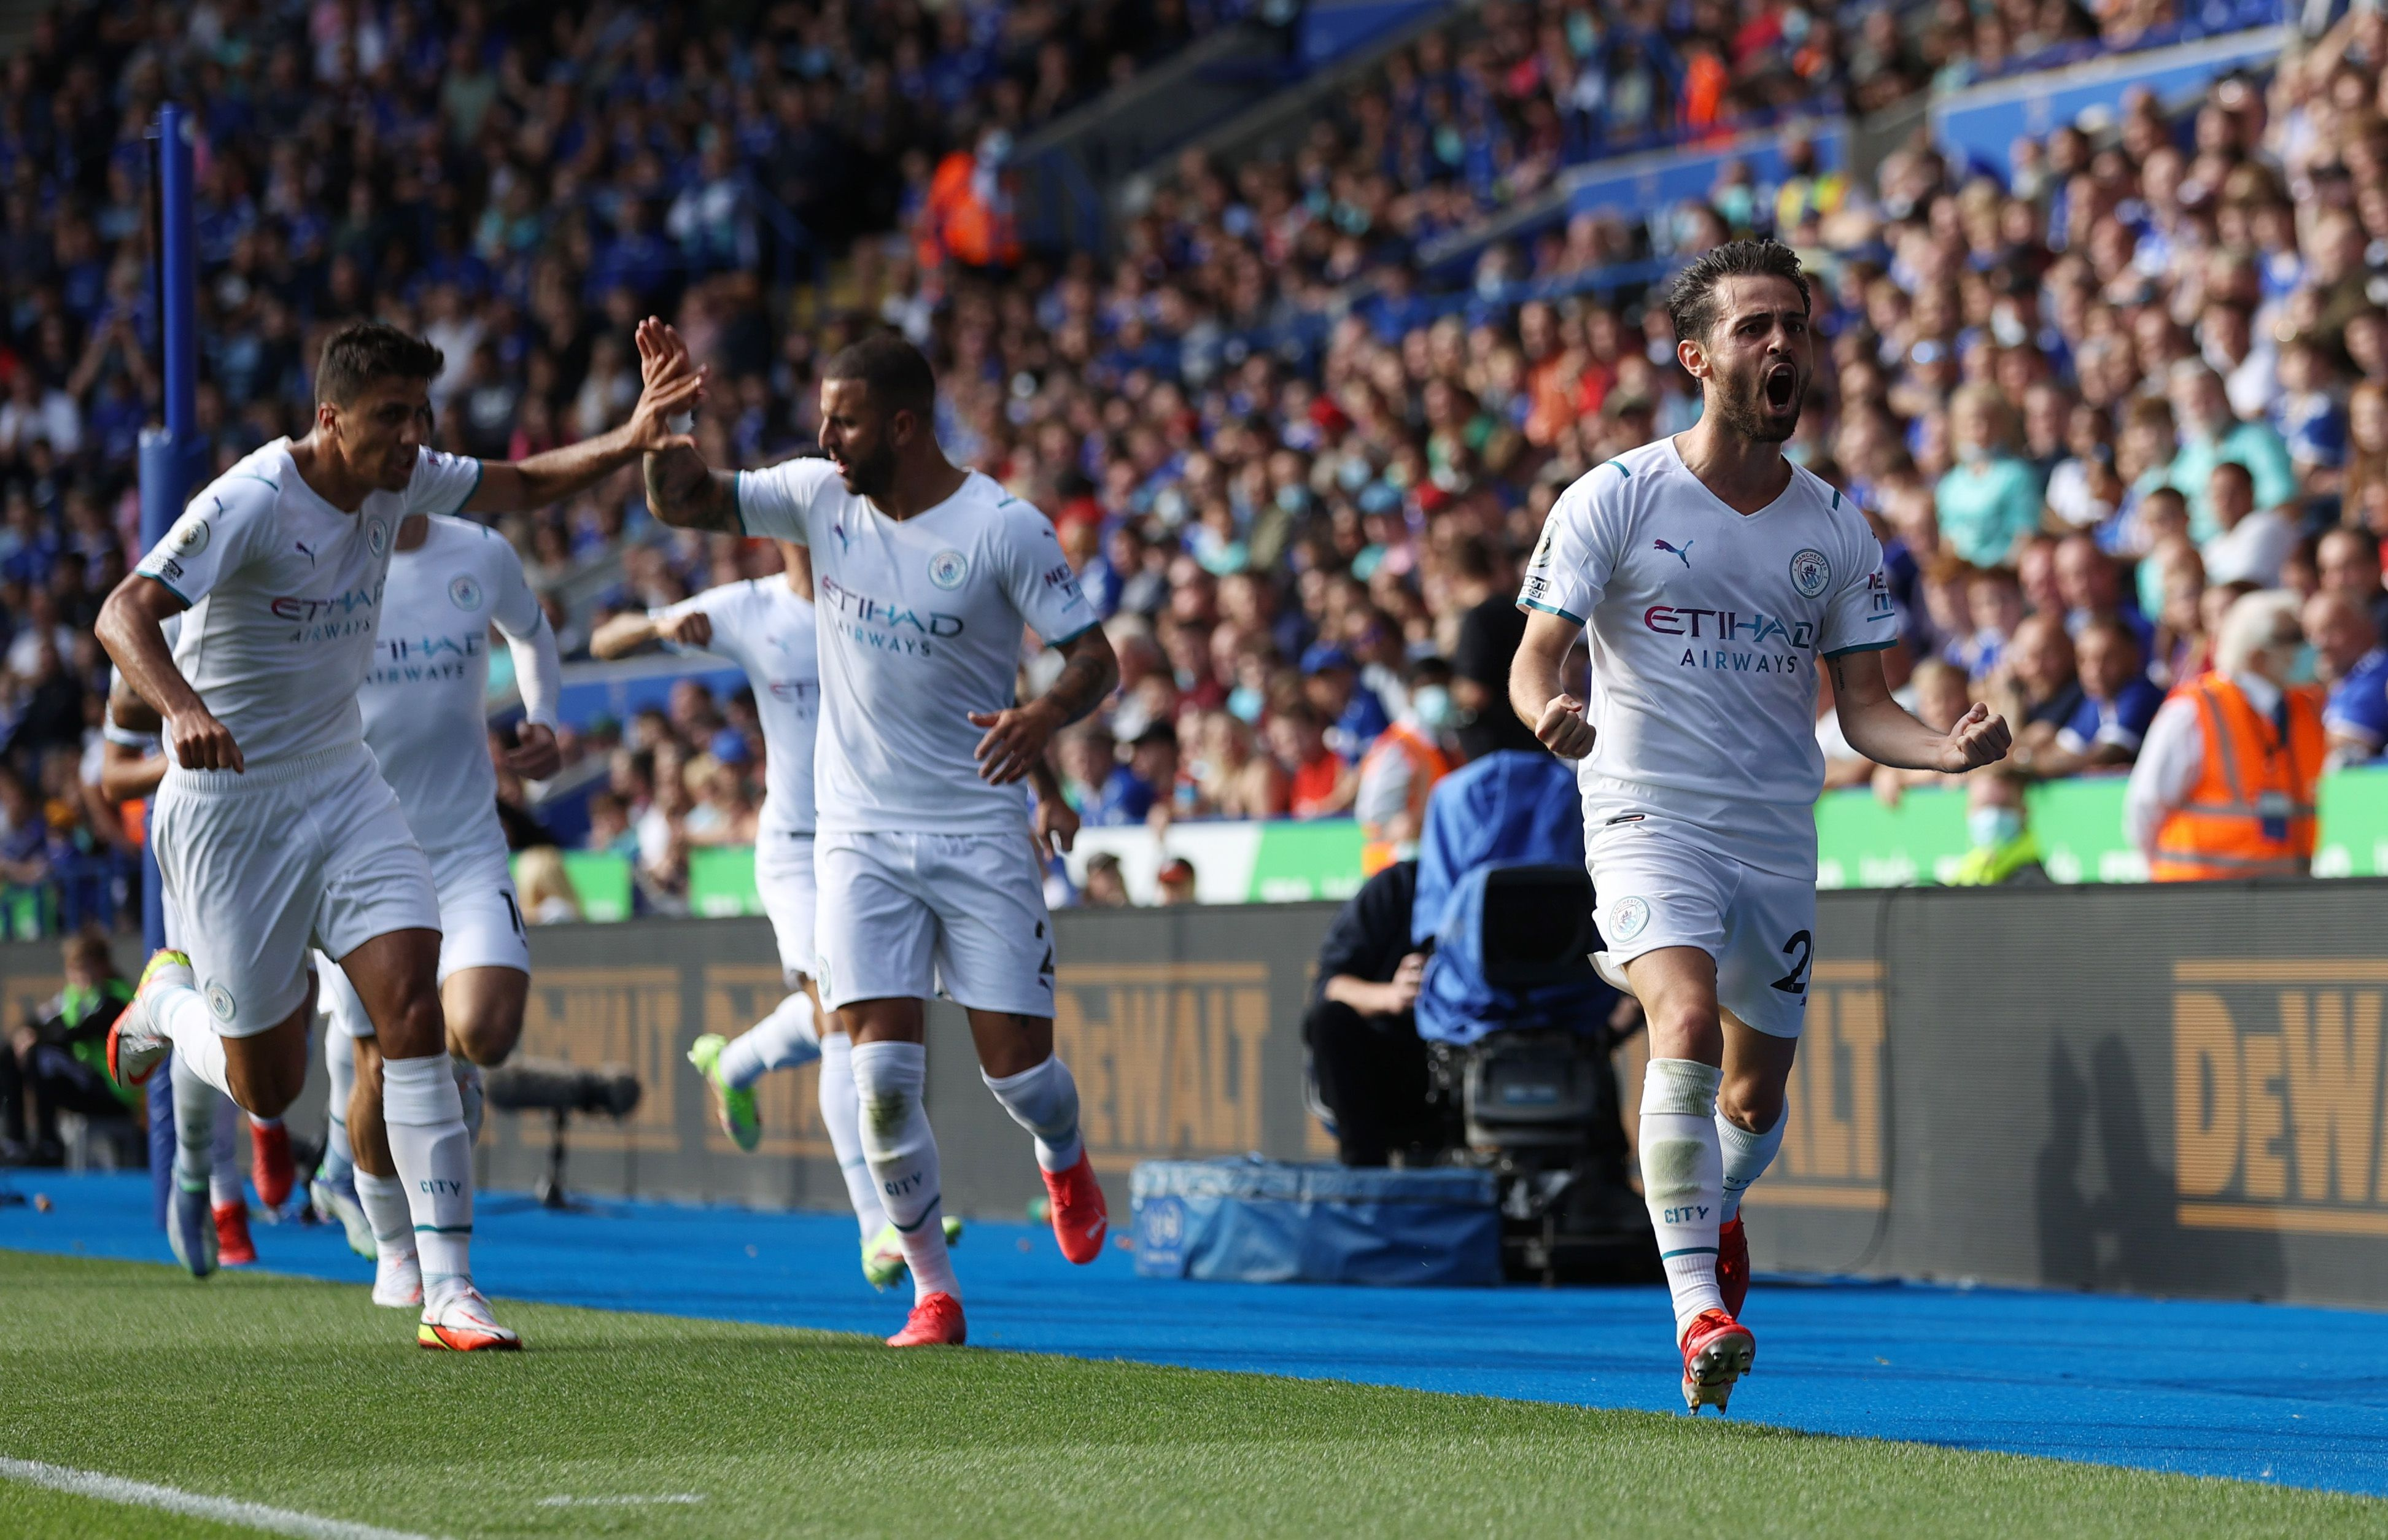 El Manchester City de Pep Guardiola debuta en la Champions League frente al RB Leipzig (Foto: Reuters)